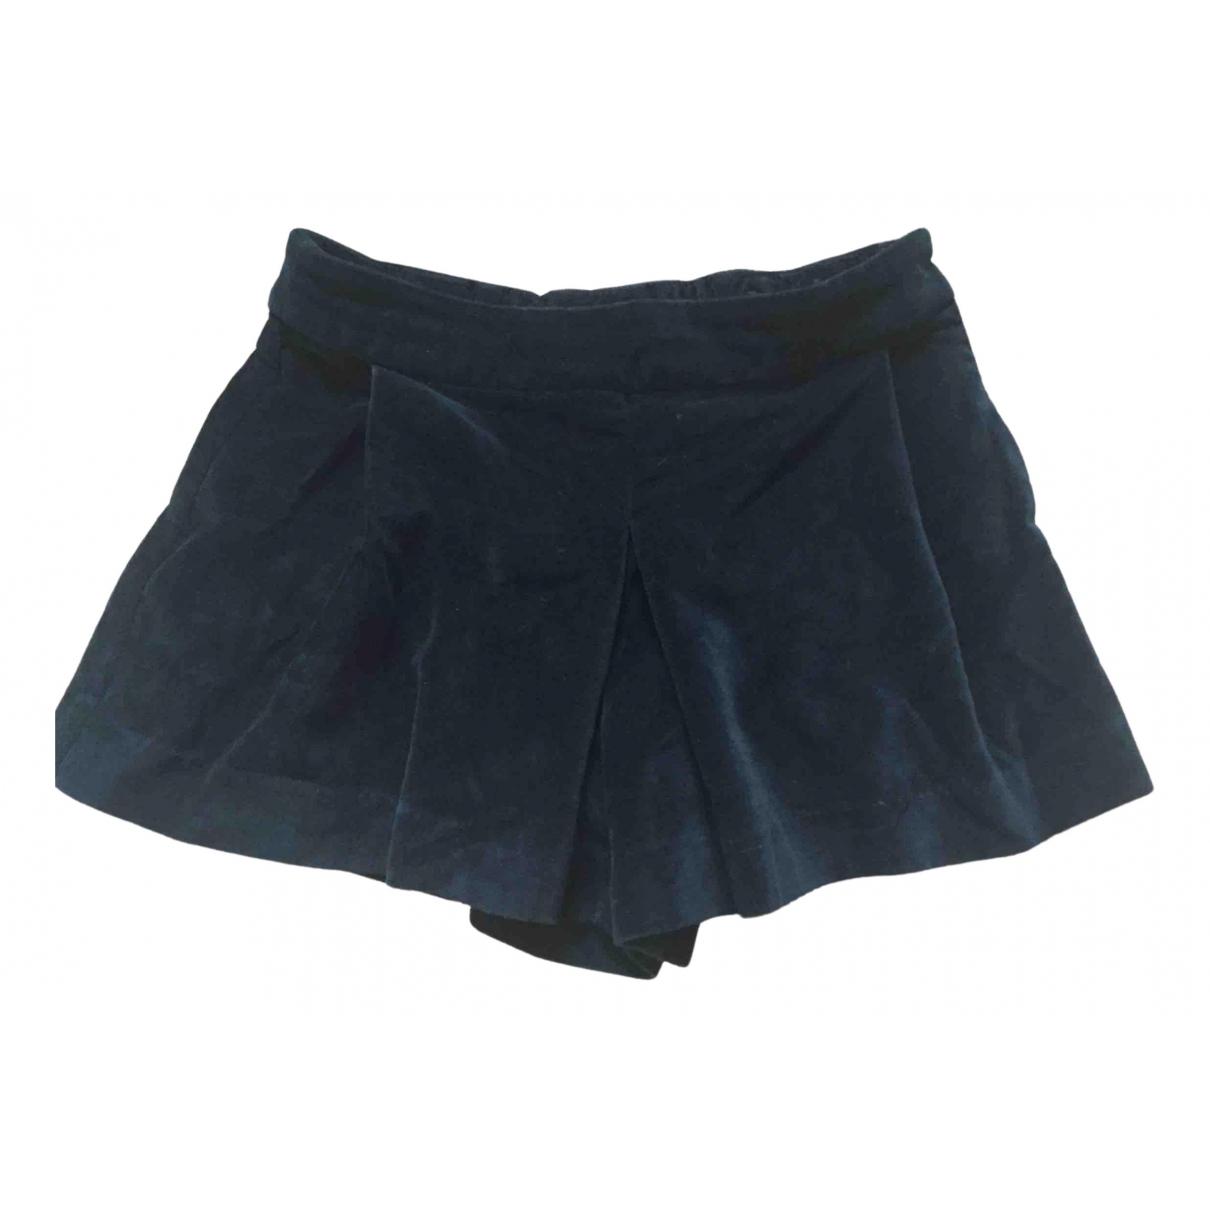 Jacadi \N Shorts in  Gruen Samt